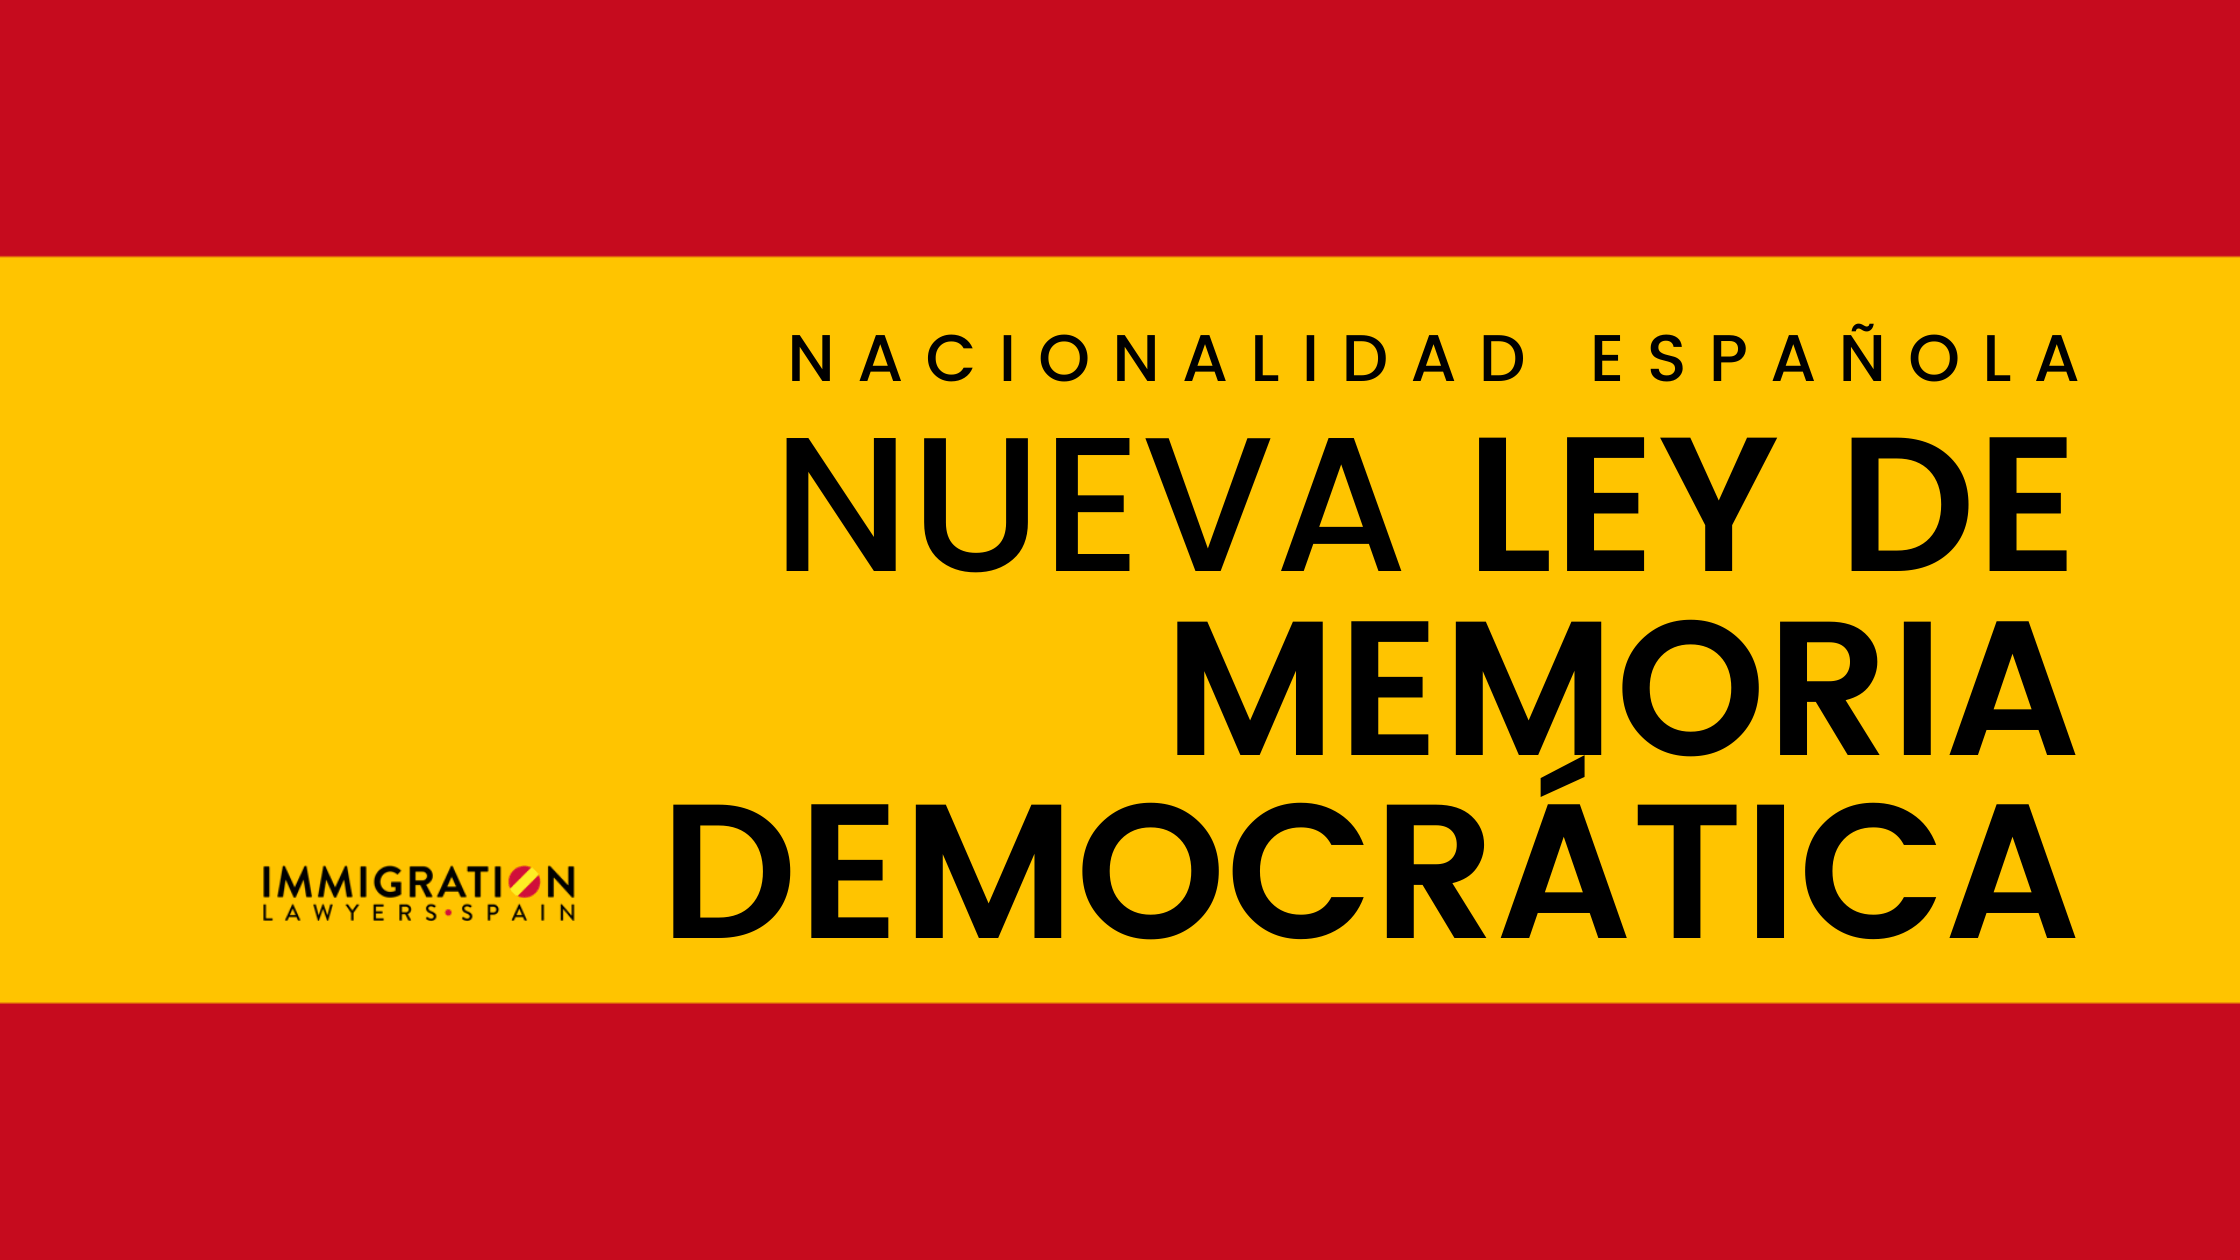 Ley de memoria democrática en España